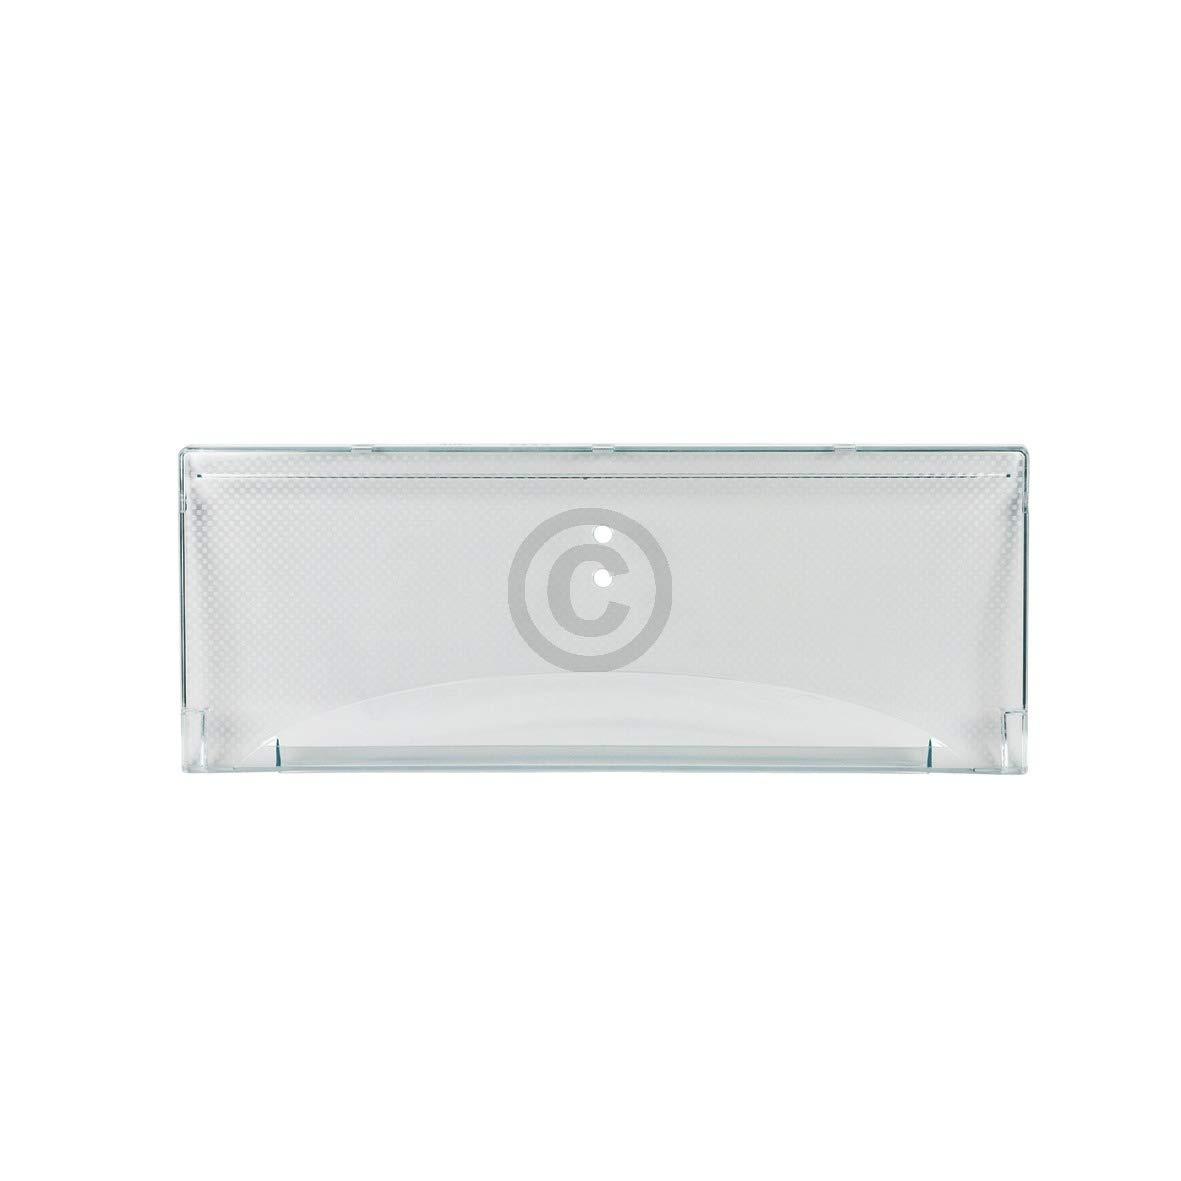 Liebherr 7428821 - Cajonera para frigorífico (390 x 151 mm ...